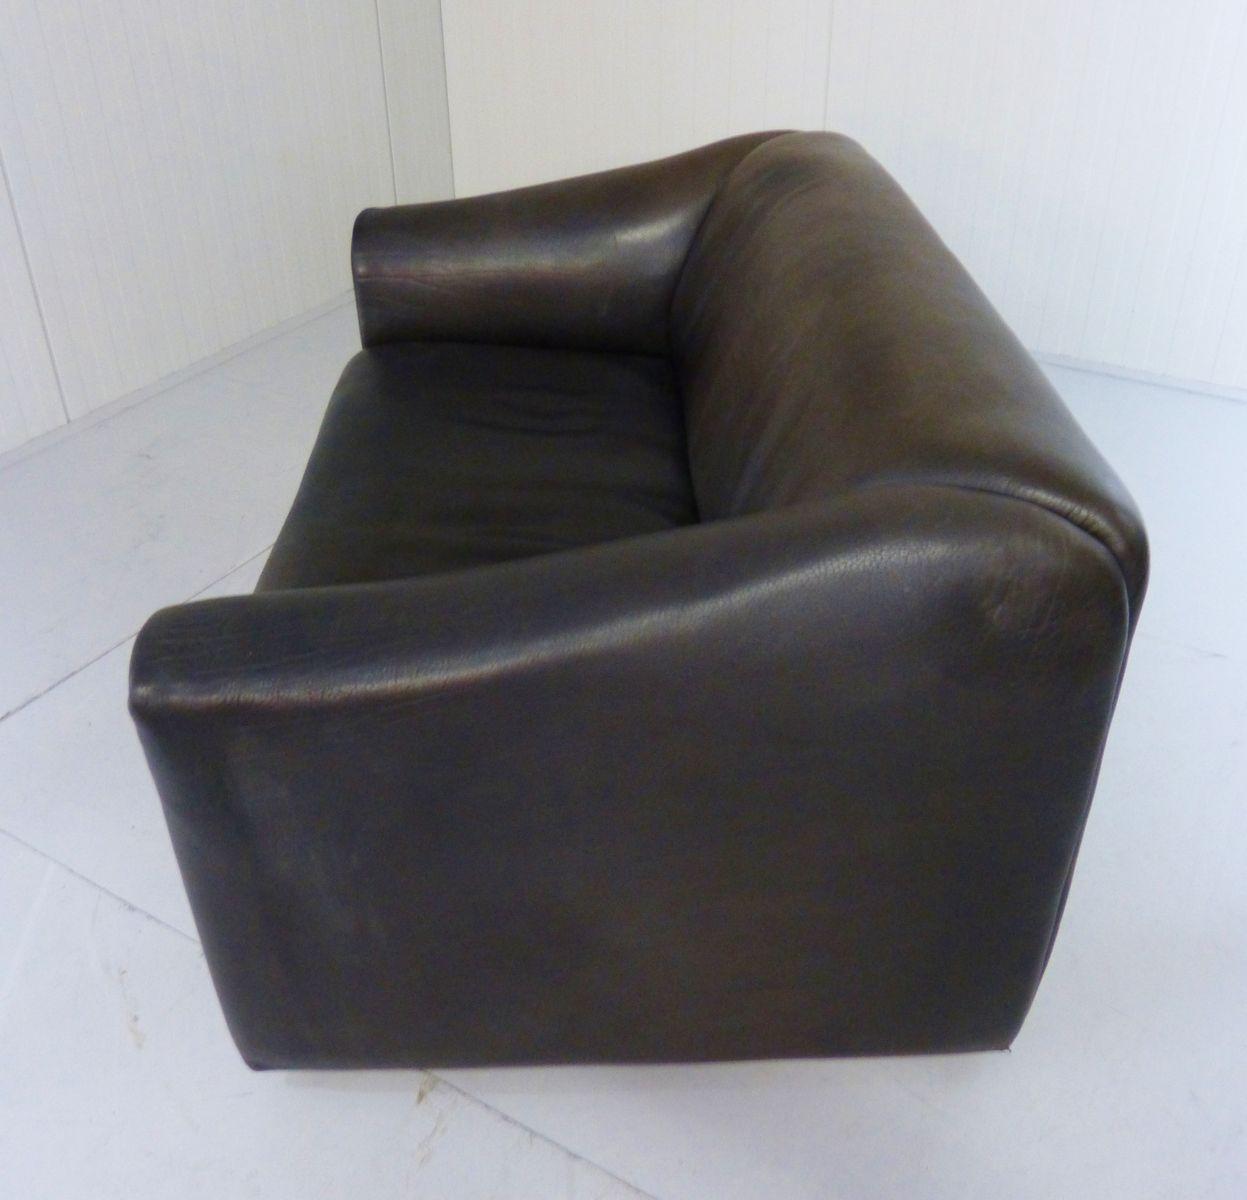 vintage ds47 2 sitzer leder sofa von de sede bei pamono kaufen. Black Bedroom Furniture Sets. Home Design Ideas